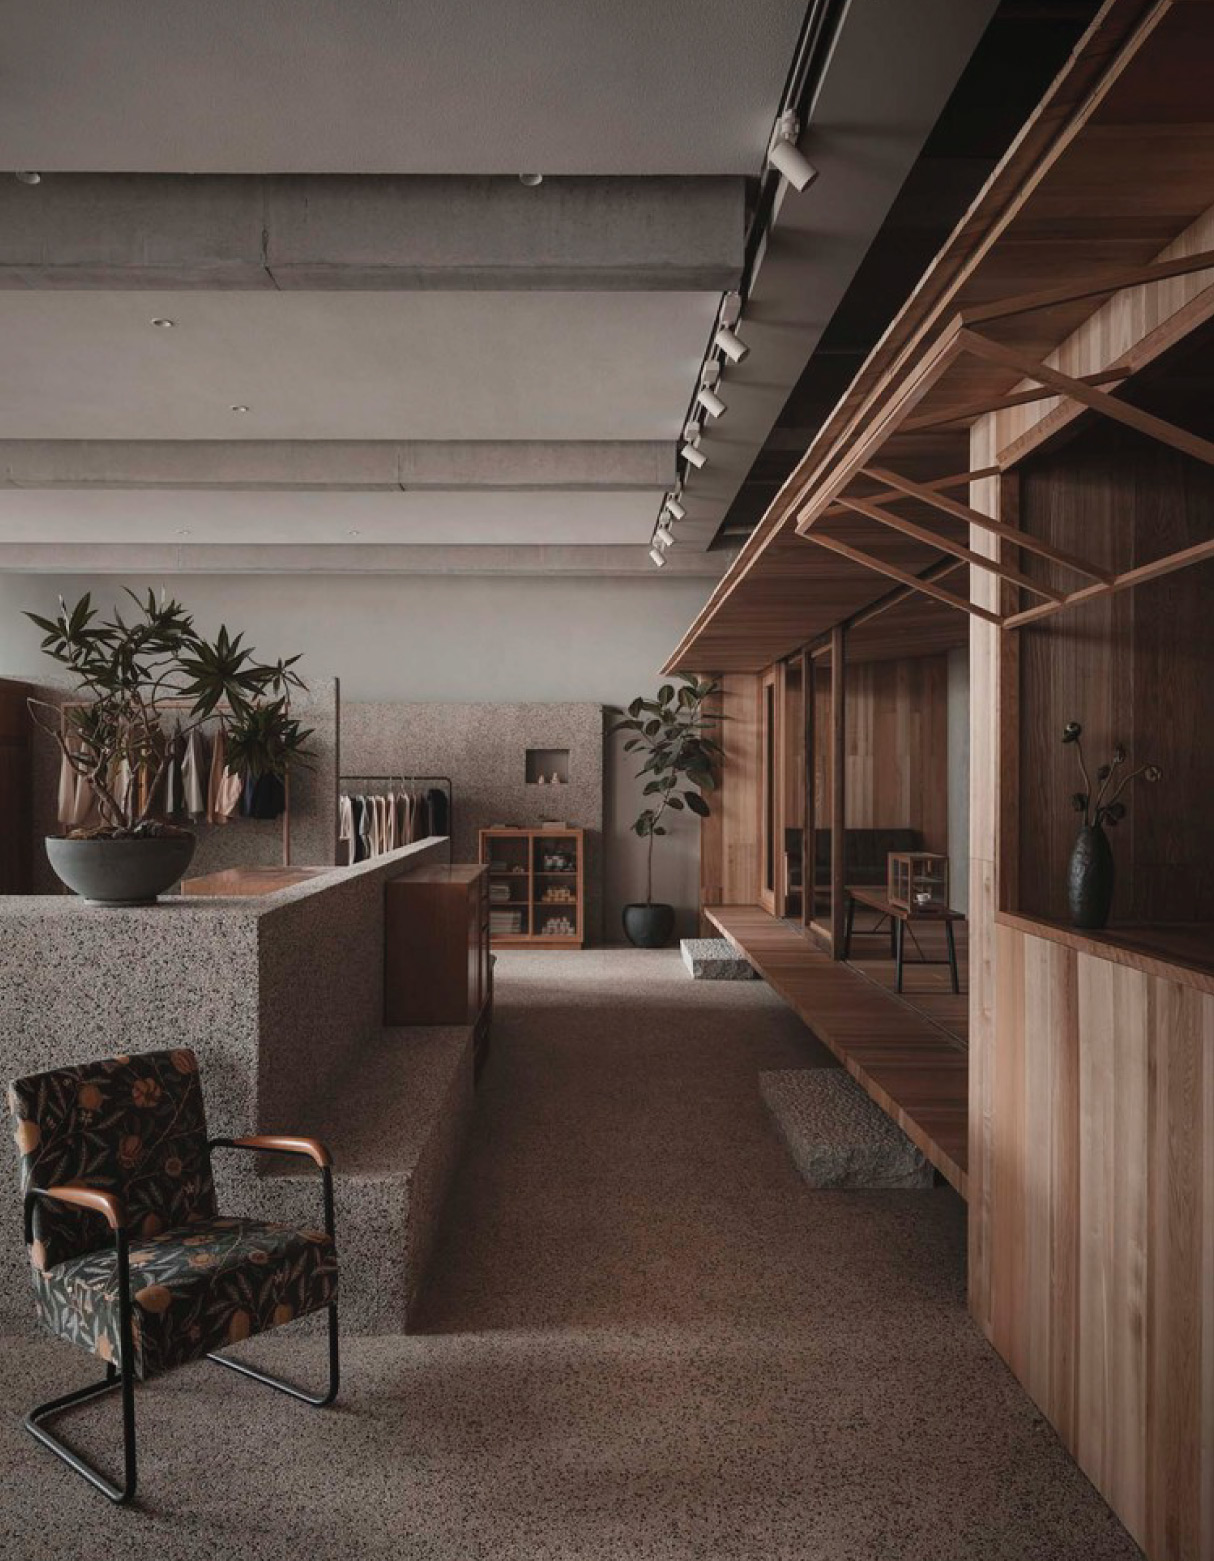 restaurante minimalista lost and found hangzhou store blue architecture studio